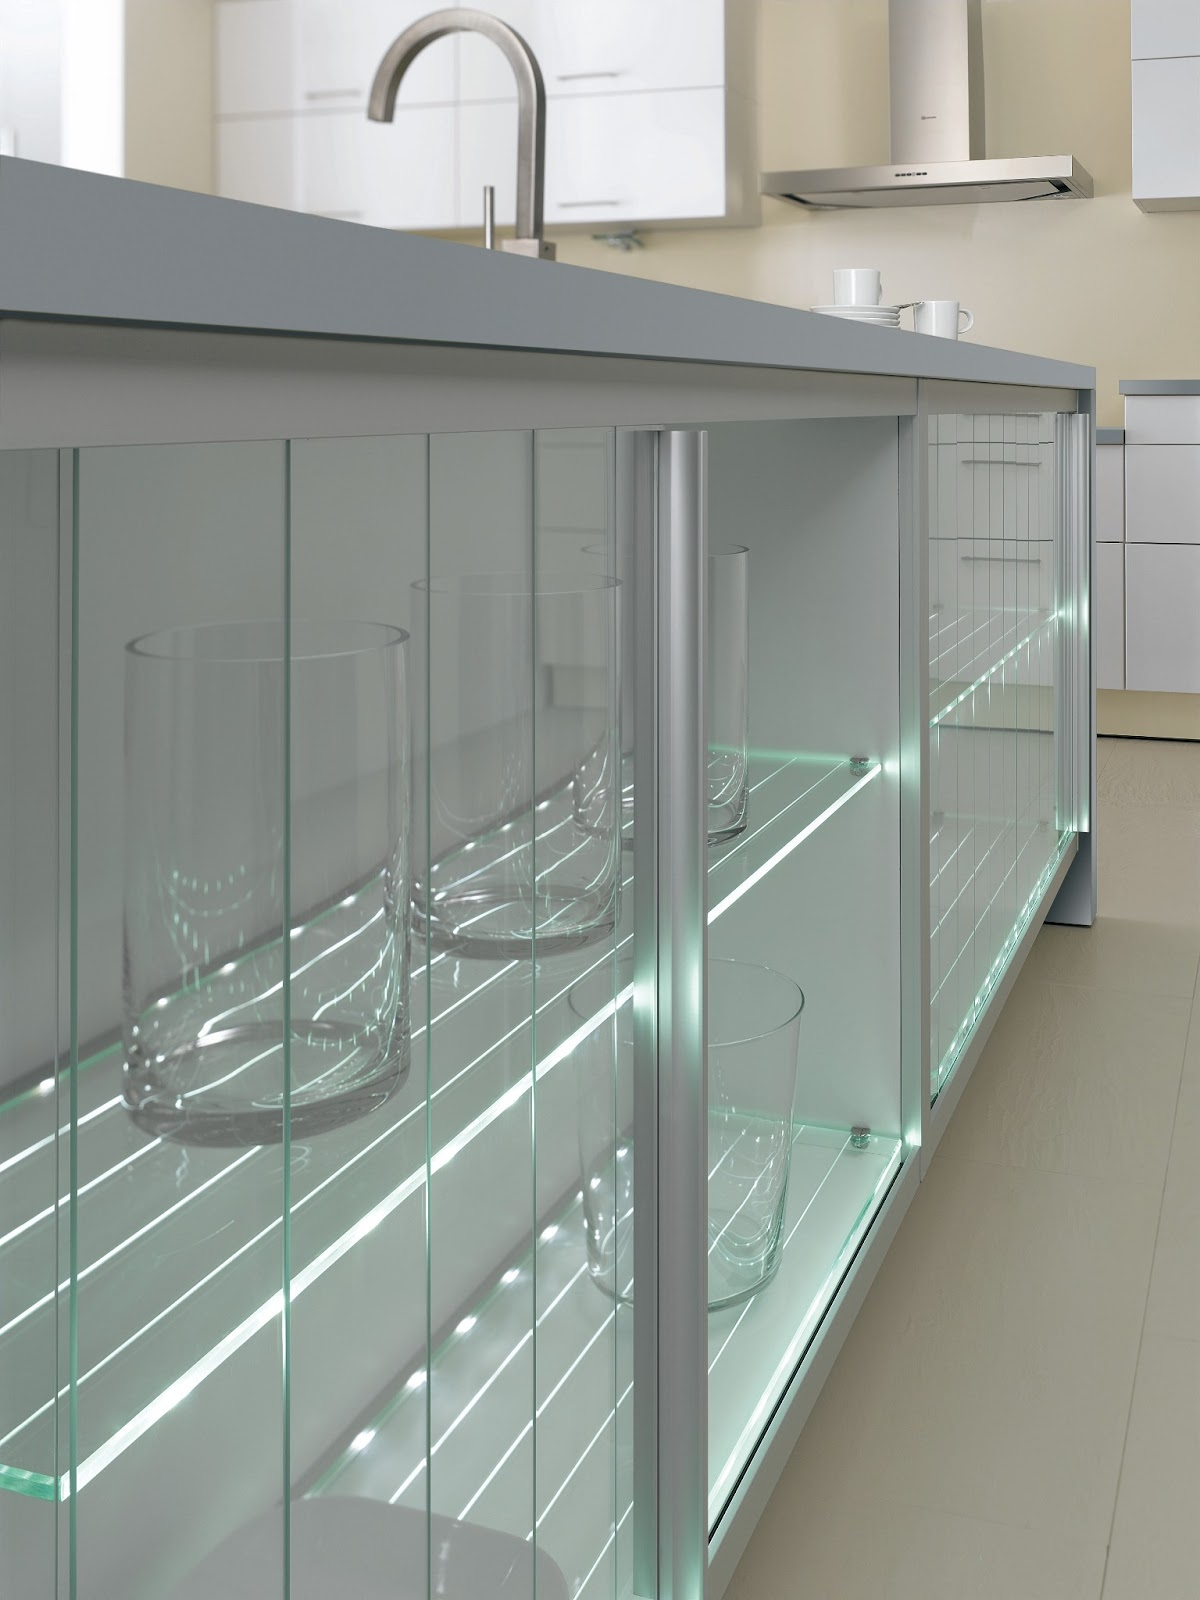 Cuisine avec mur d 39 armoires for Meuble design cuisine